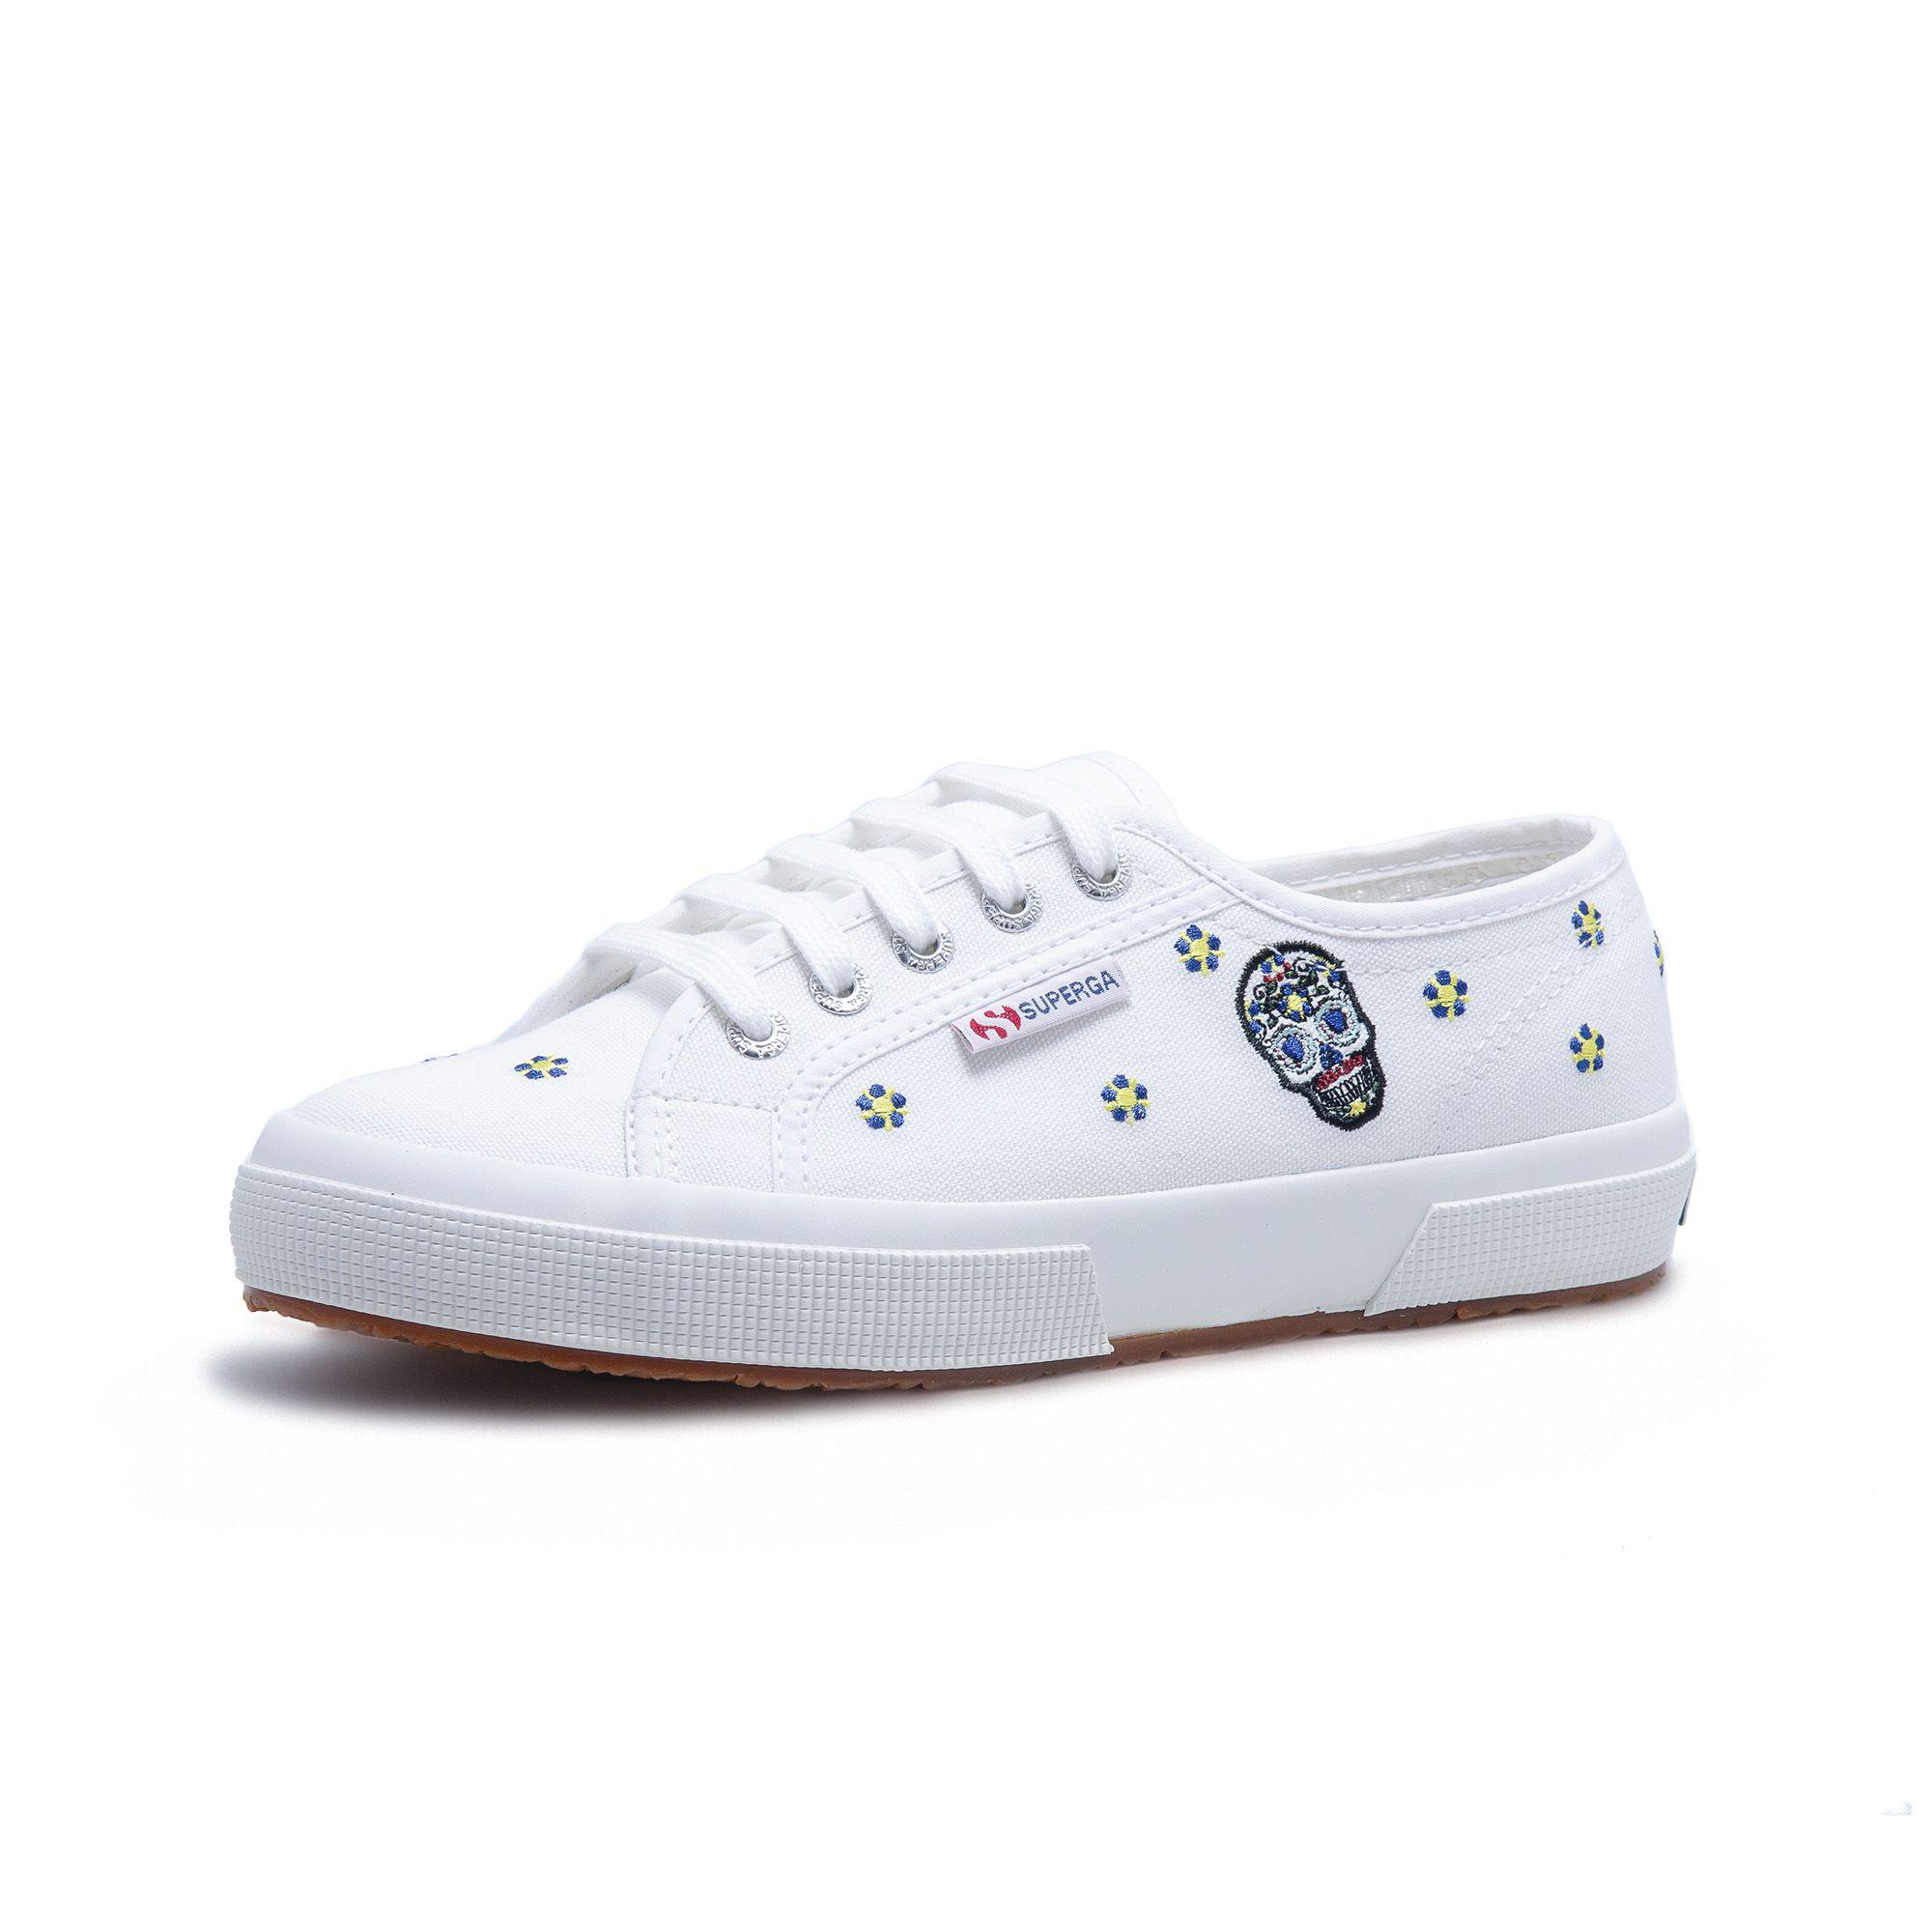 2750 COTW DANIELA BO WHITE